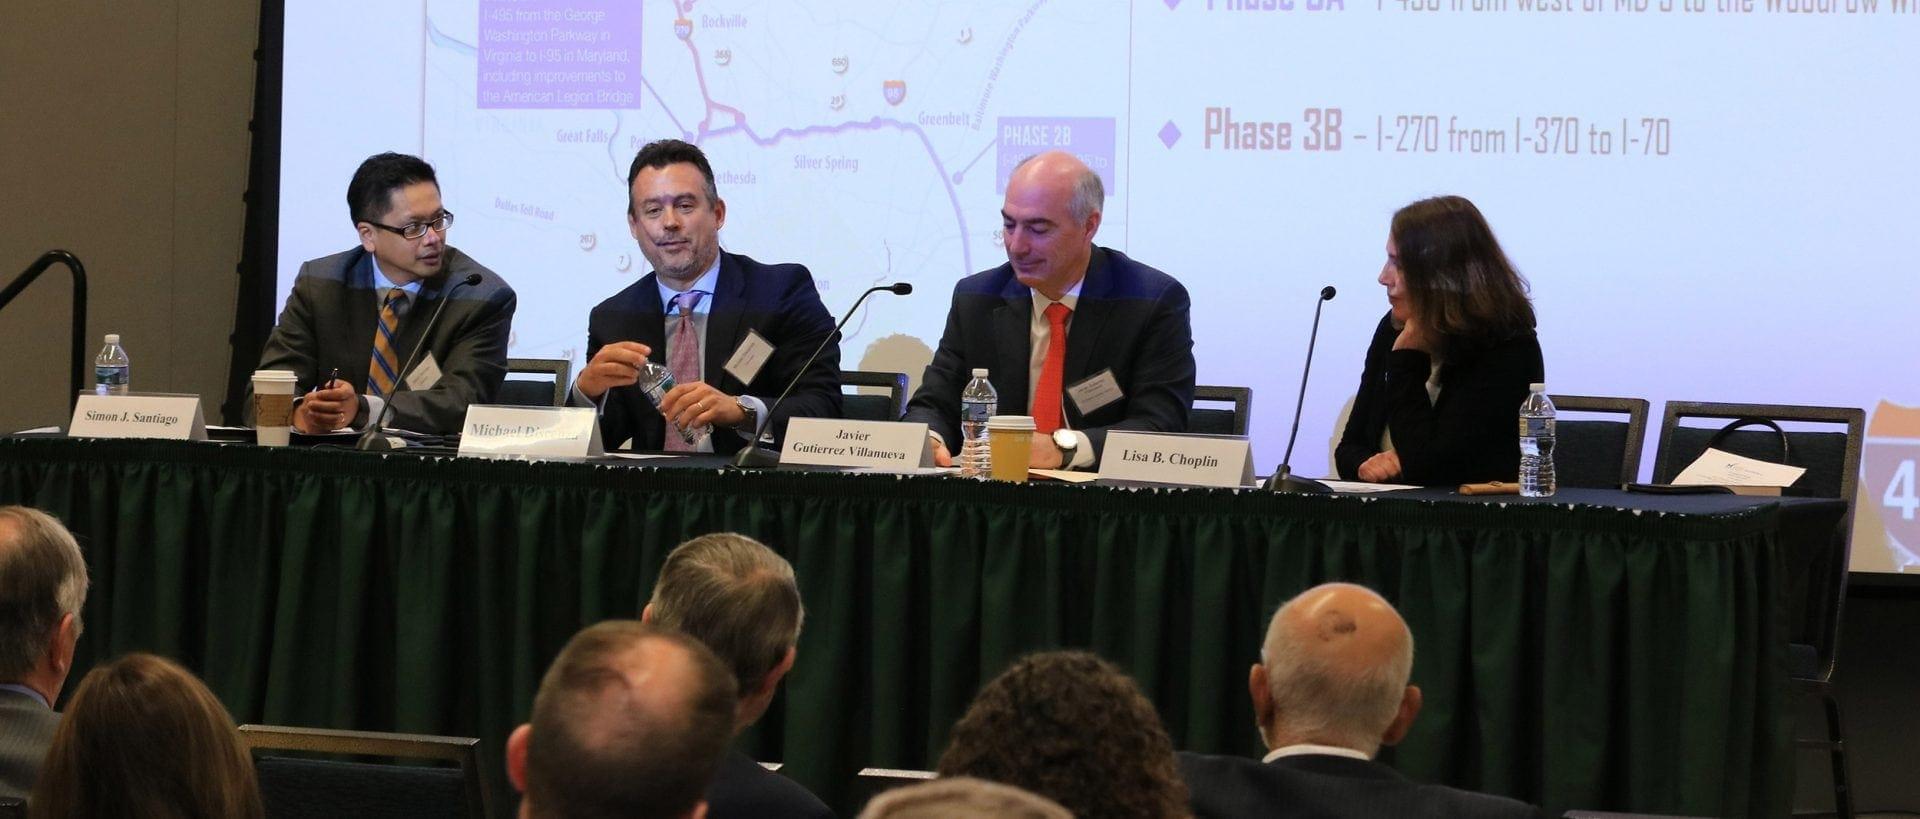 Javier Gutiérrez, CEO Javier Gutiérrez, I-66 highway CEO, participated in a panel on Regional Highway Programs